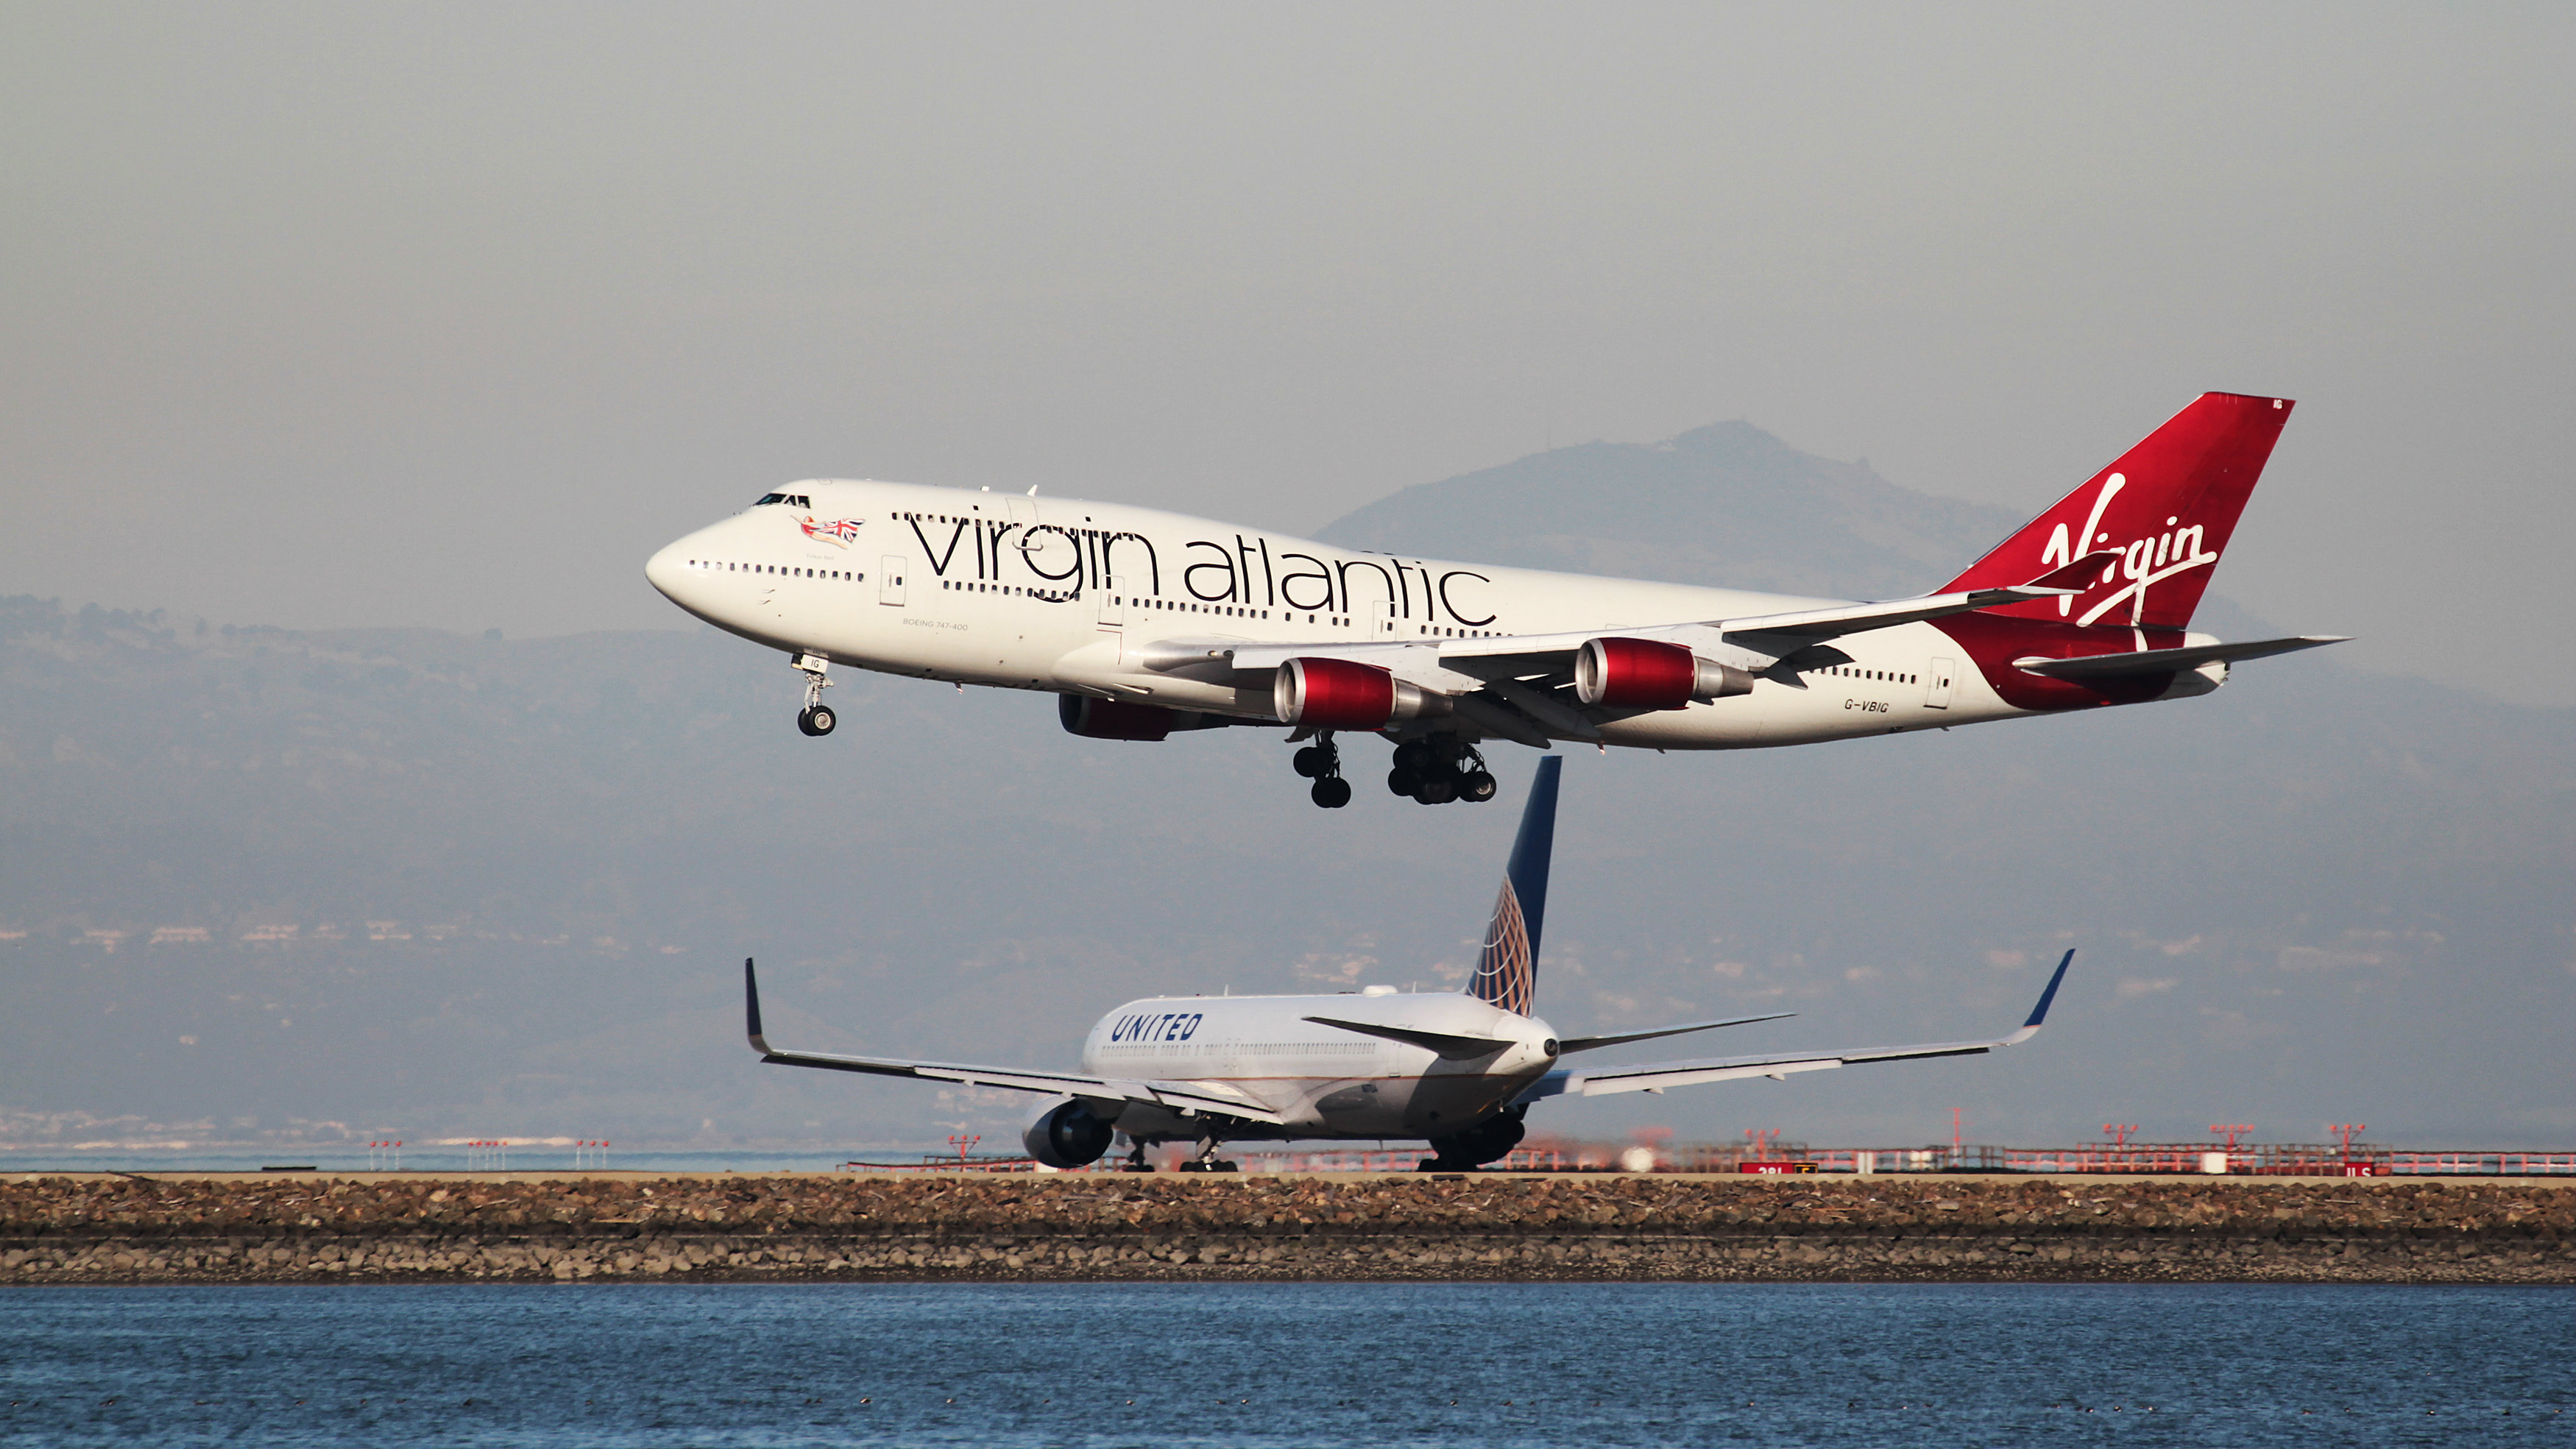 Long haul transatlantic airlines